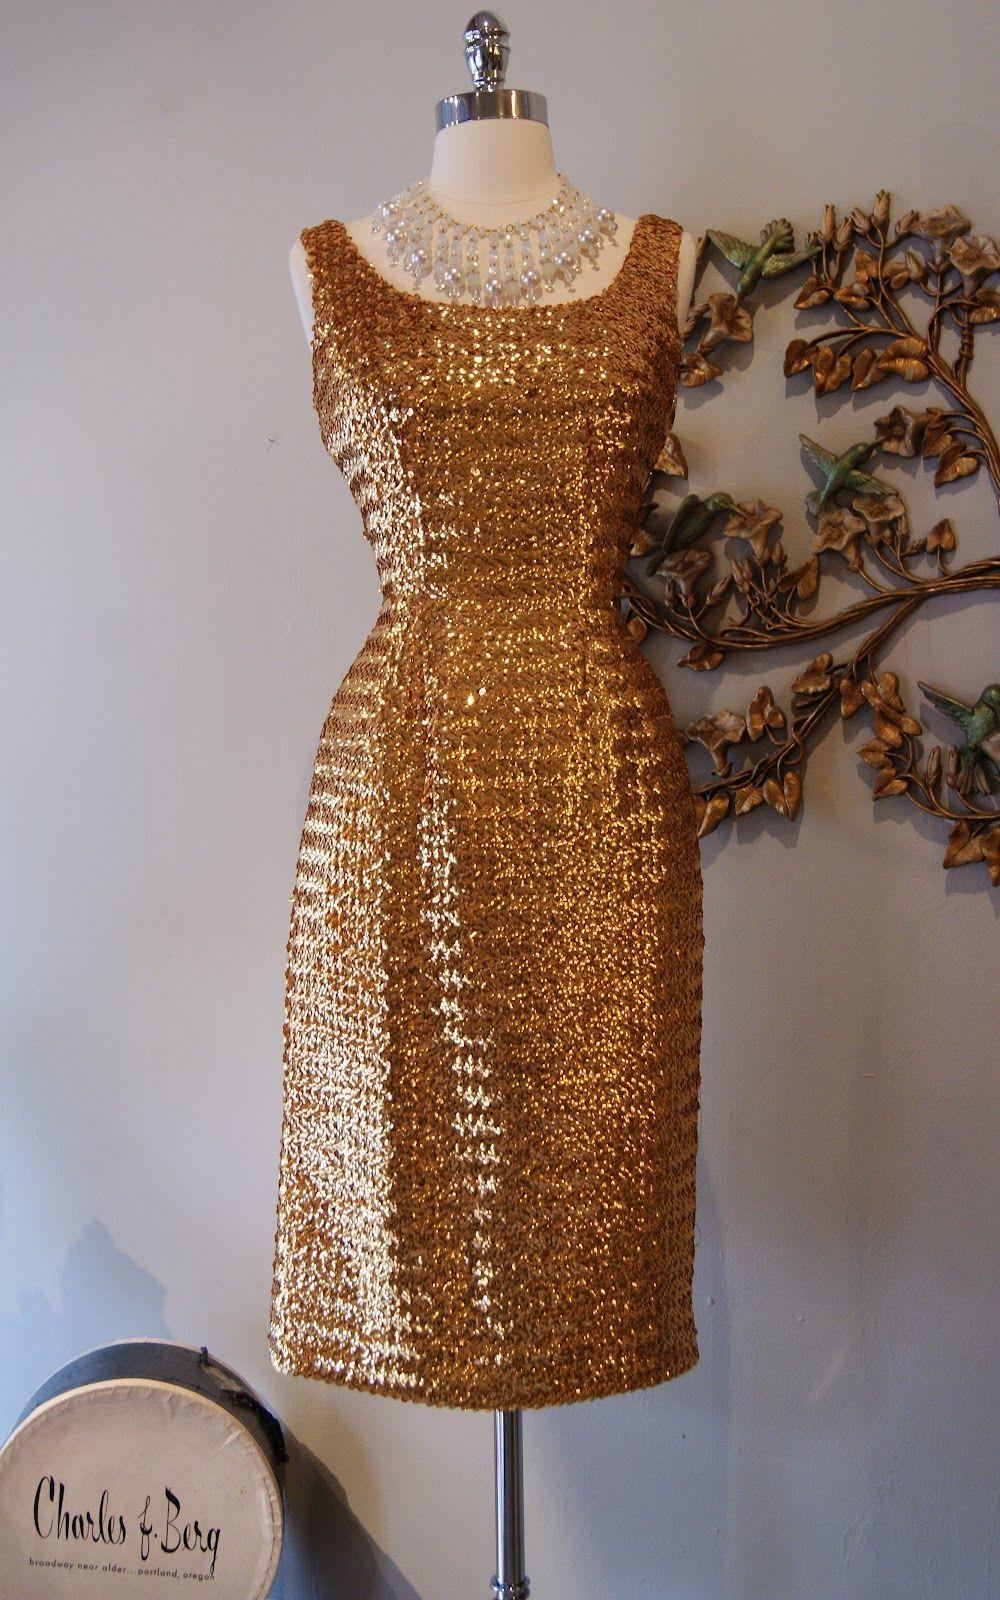 Xtabay Vintage Clothing Boutique Portland Oregon Vintage Dresses 1960s Vintage Clothing Boutique Vintage Dresses [ 1600 x 1000 Pixel ]